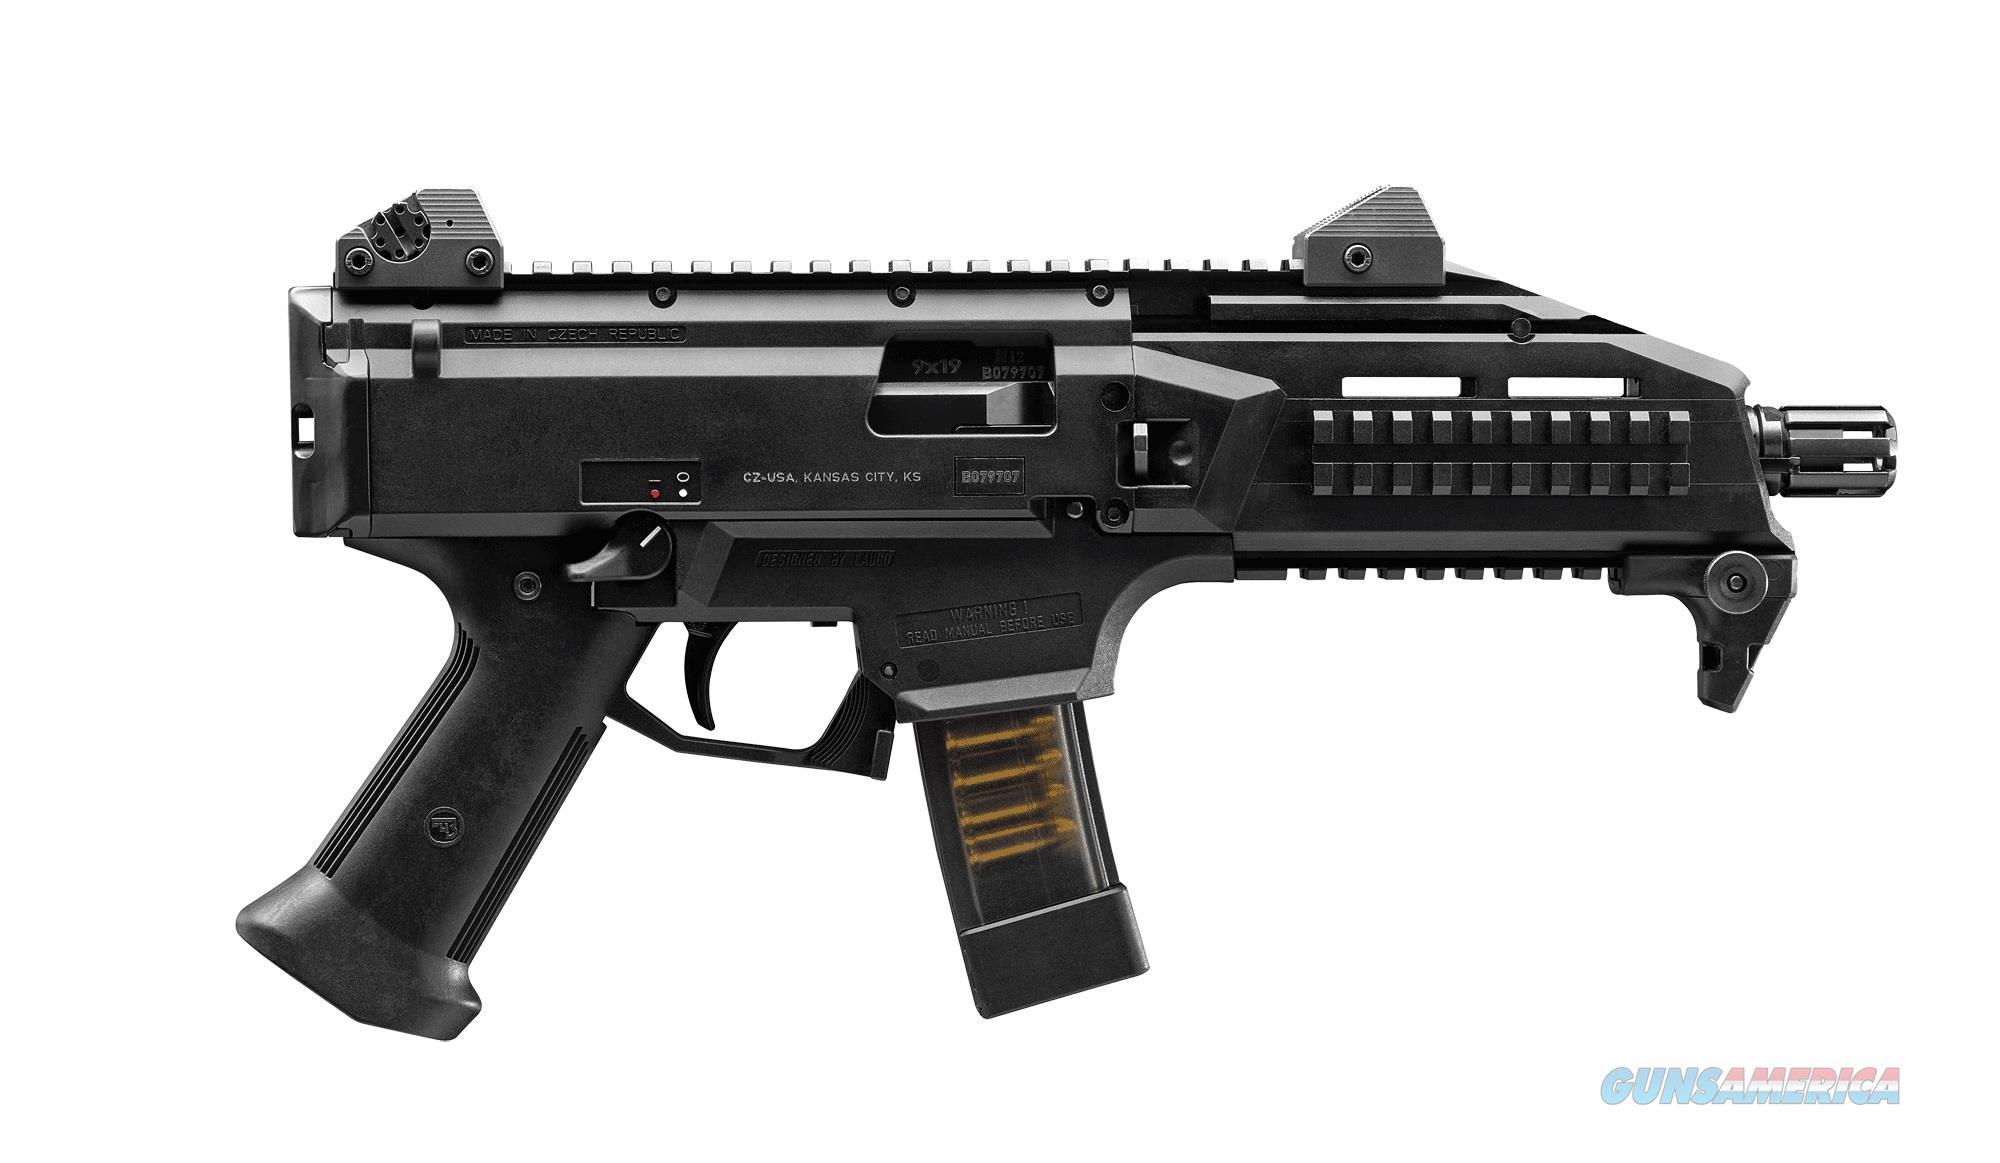 "CZ-USA Scorpion EVO 3 S1 9mm Luger 7.75"" 10 Rounds 01351  Guns > Pistols > CZ Pistols"